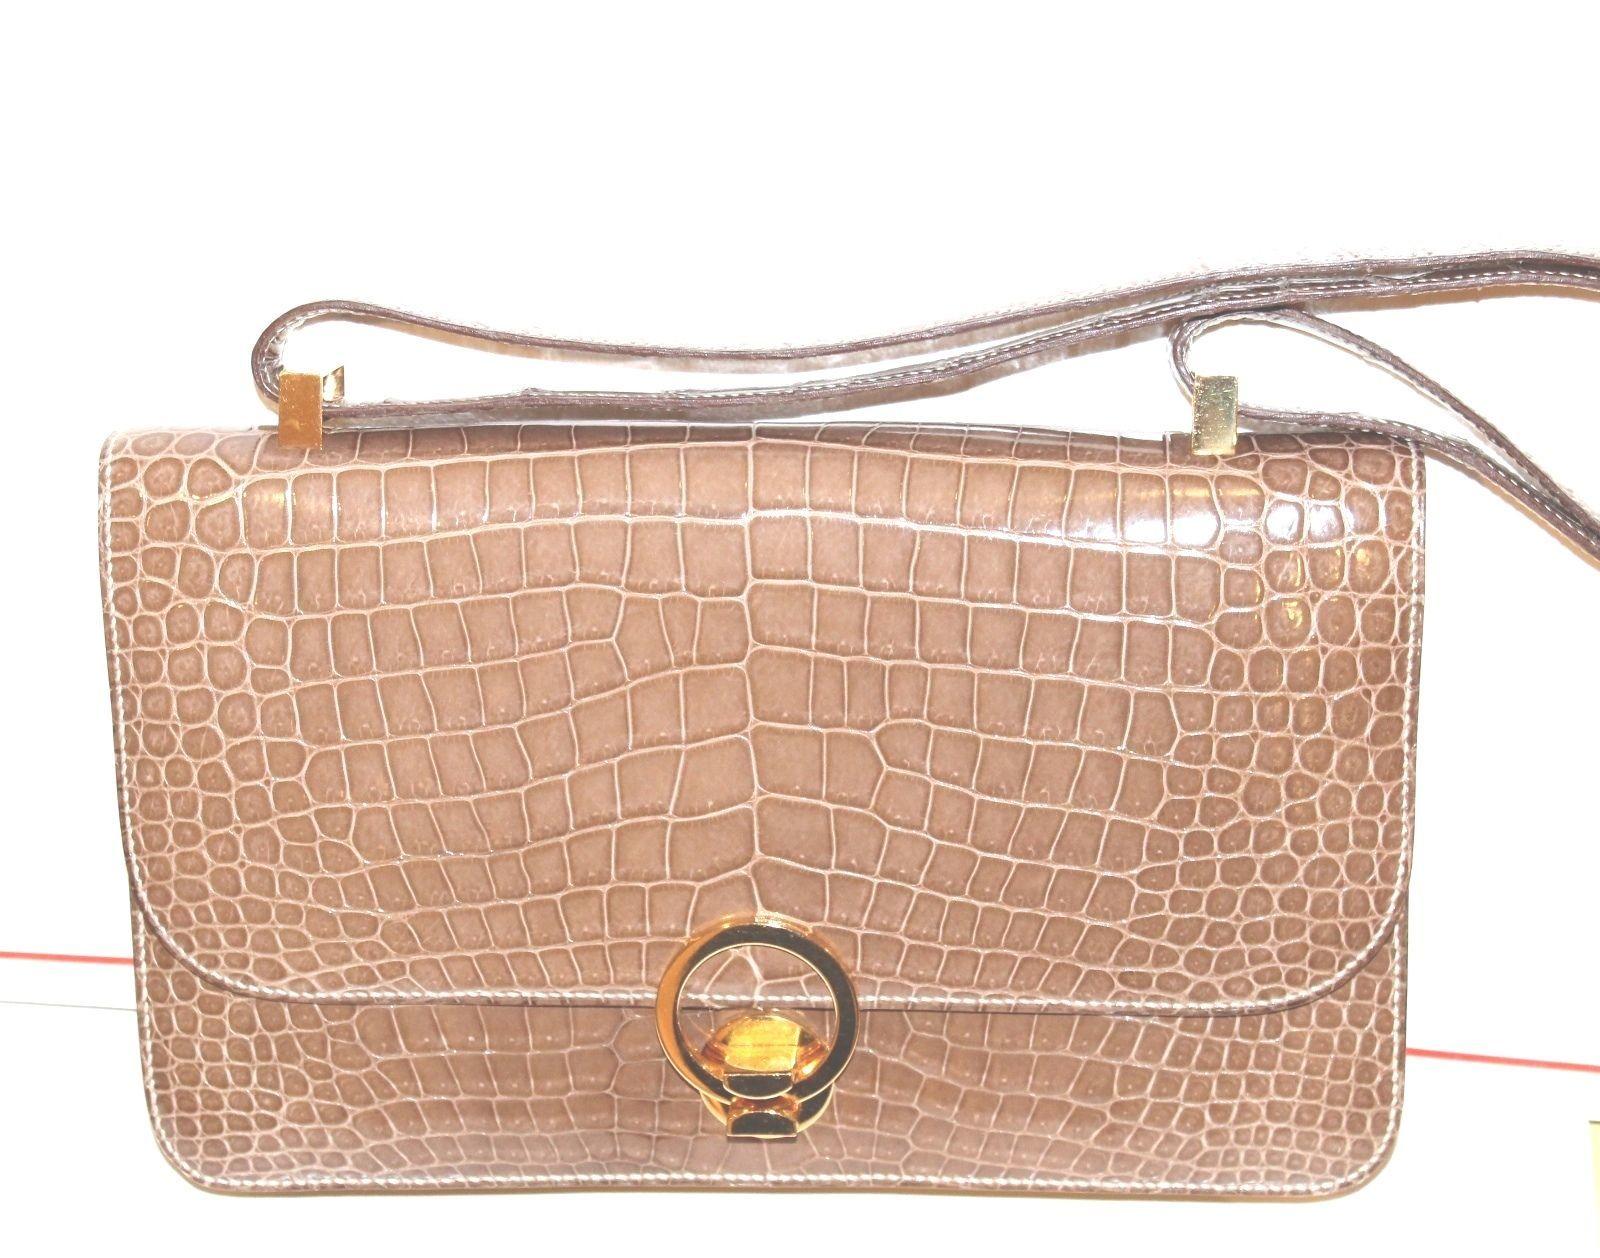 Vintage Hermes  Alligator Crocodile  Handbag Purse clutch